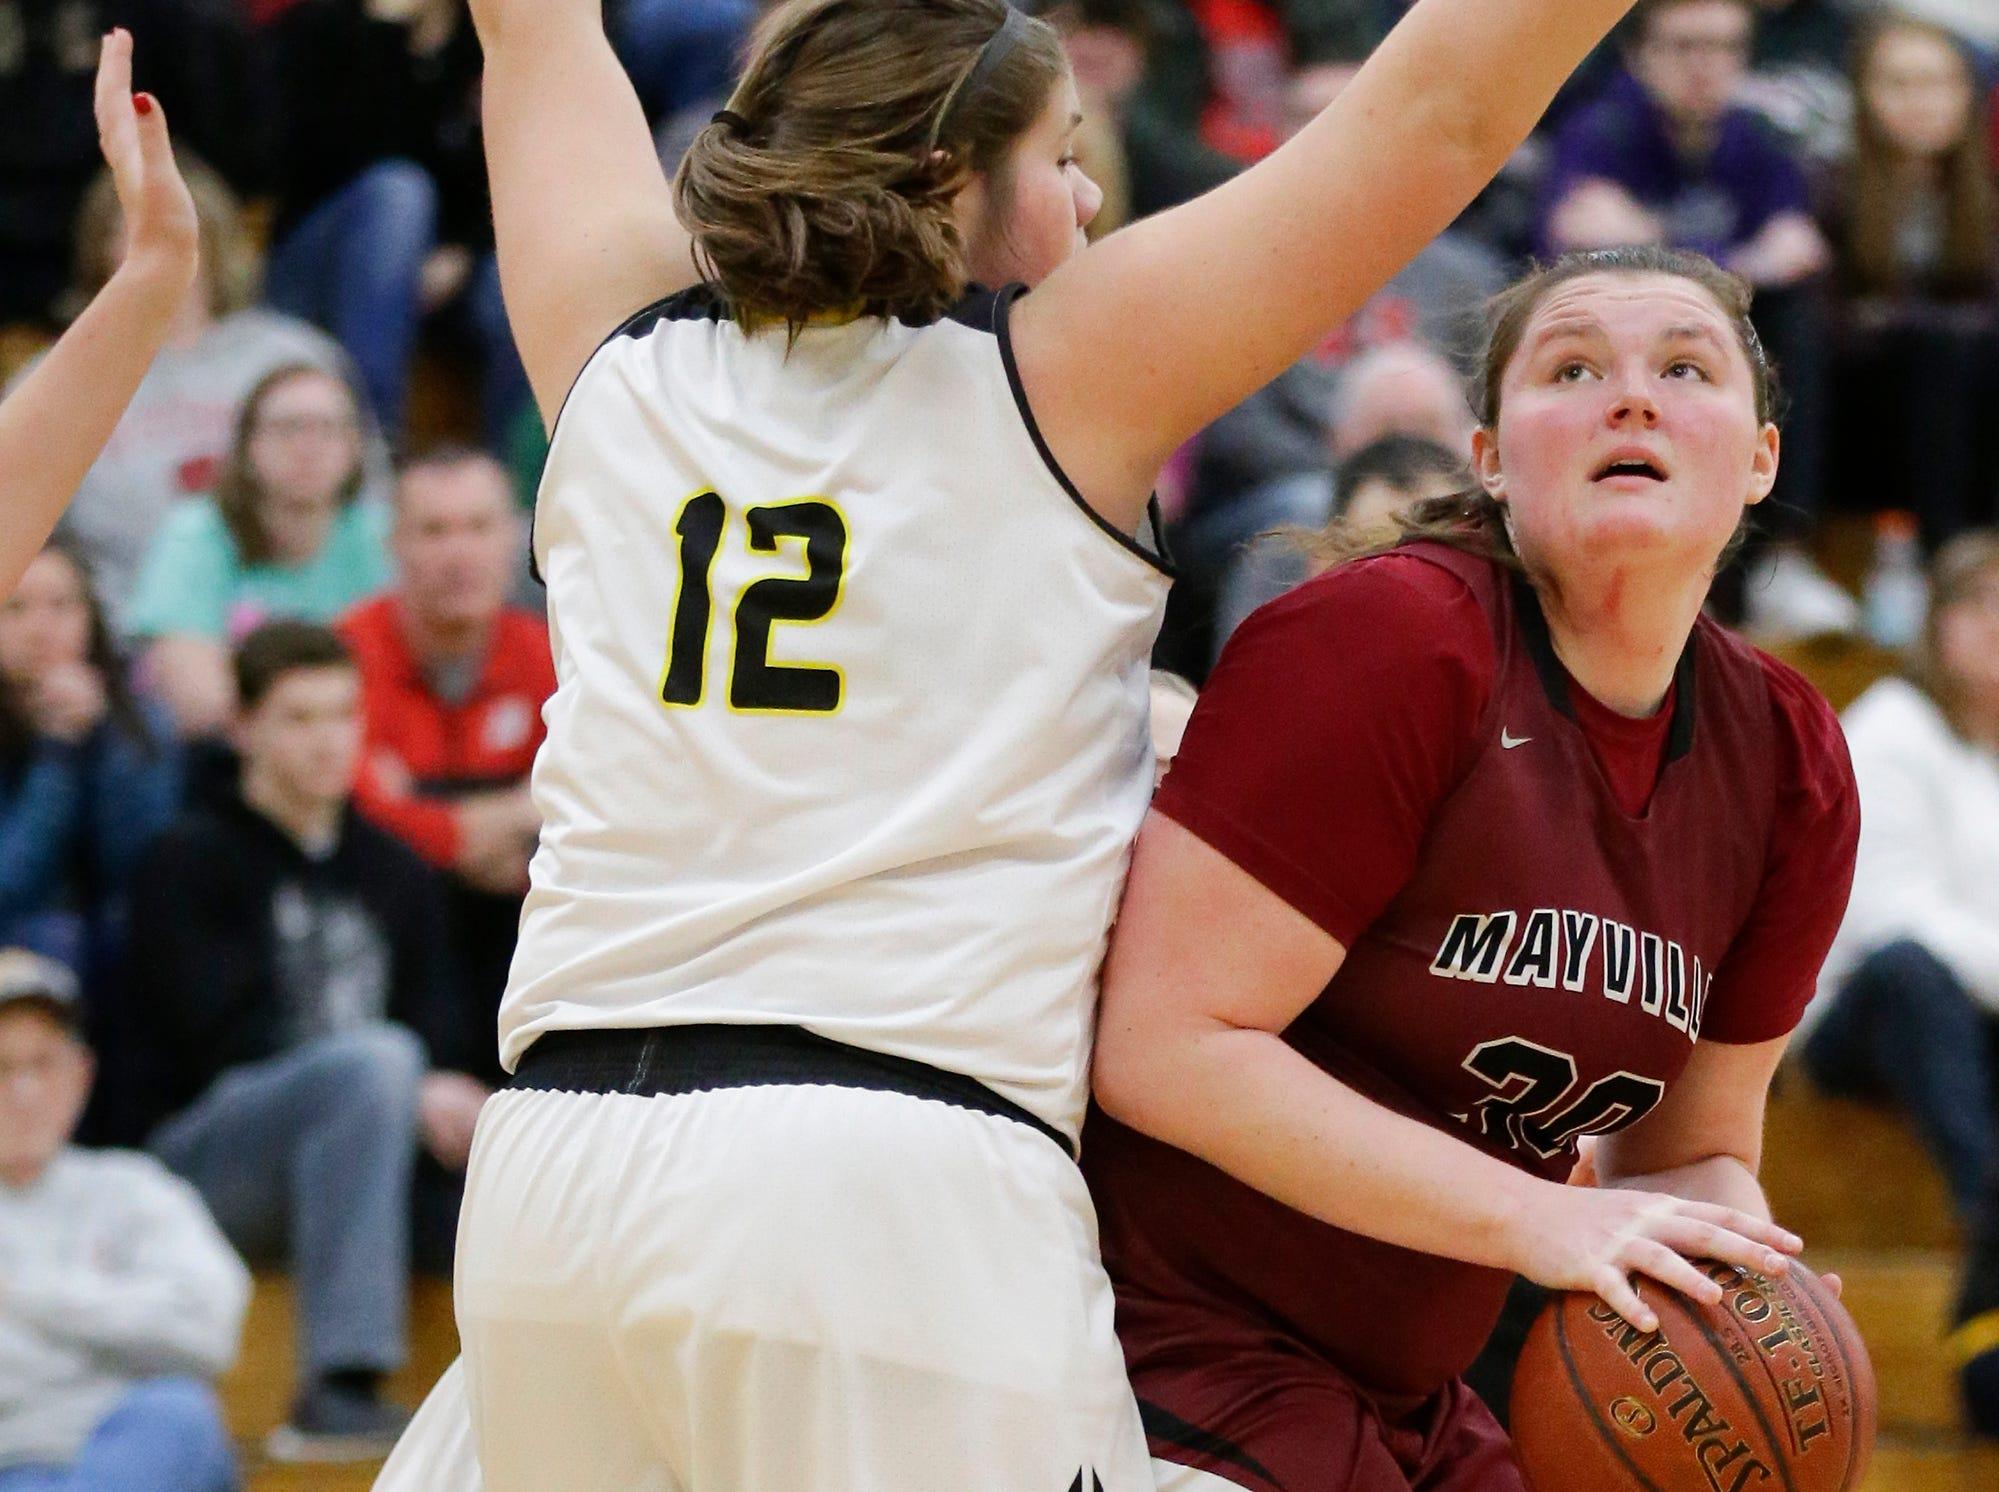 Waupun High School girls basketball's Kelli Bonack (12) defends Mayville High School's Sydney Schultz (30) Saturday, February 23, 2019 during their WIAA Division 4 sectional quarterfinal game in Waupun. Waupun won the game 62-45. Doug Raflik/USA TODAY NETWORK-Wisconsin